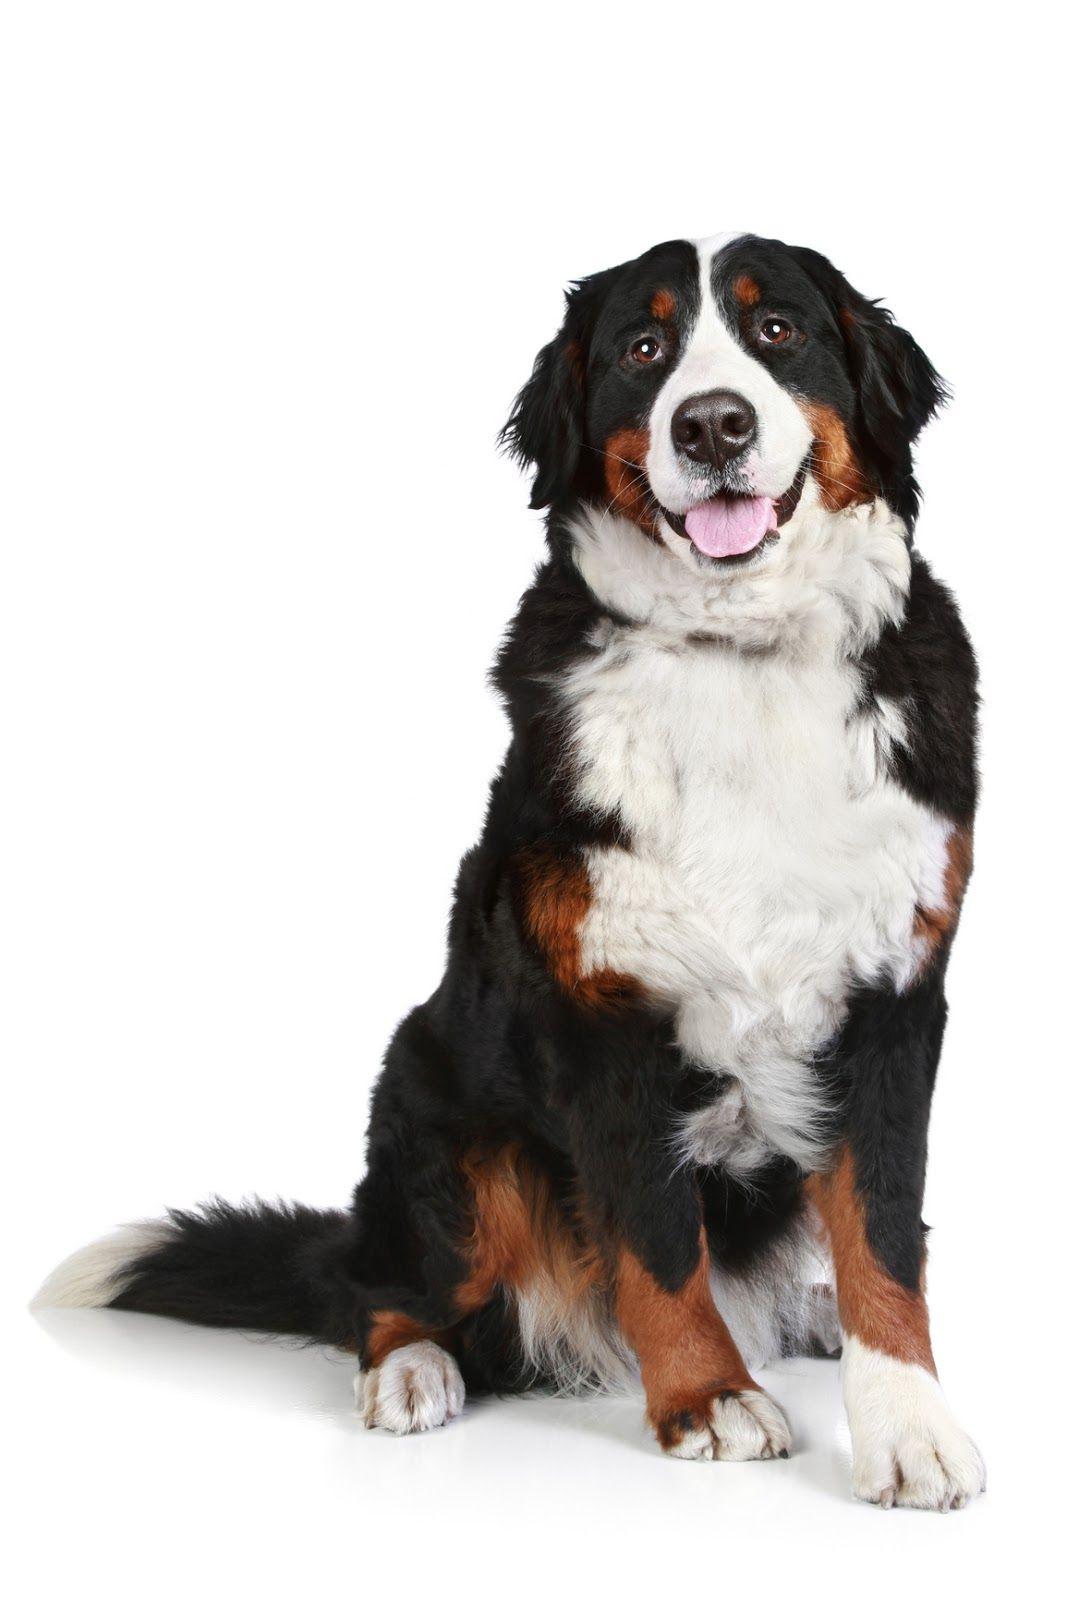 Perro San Bernardo Dog Care Dogs Mountain Dogs